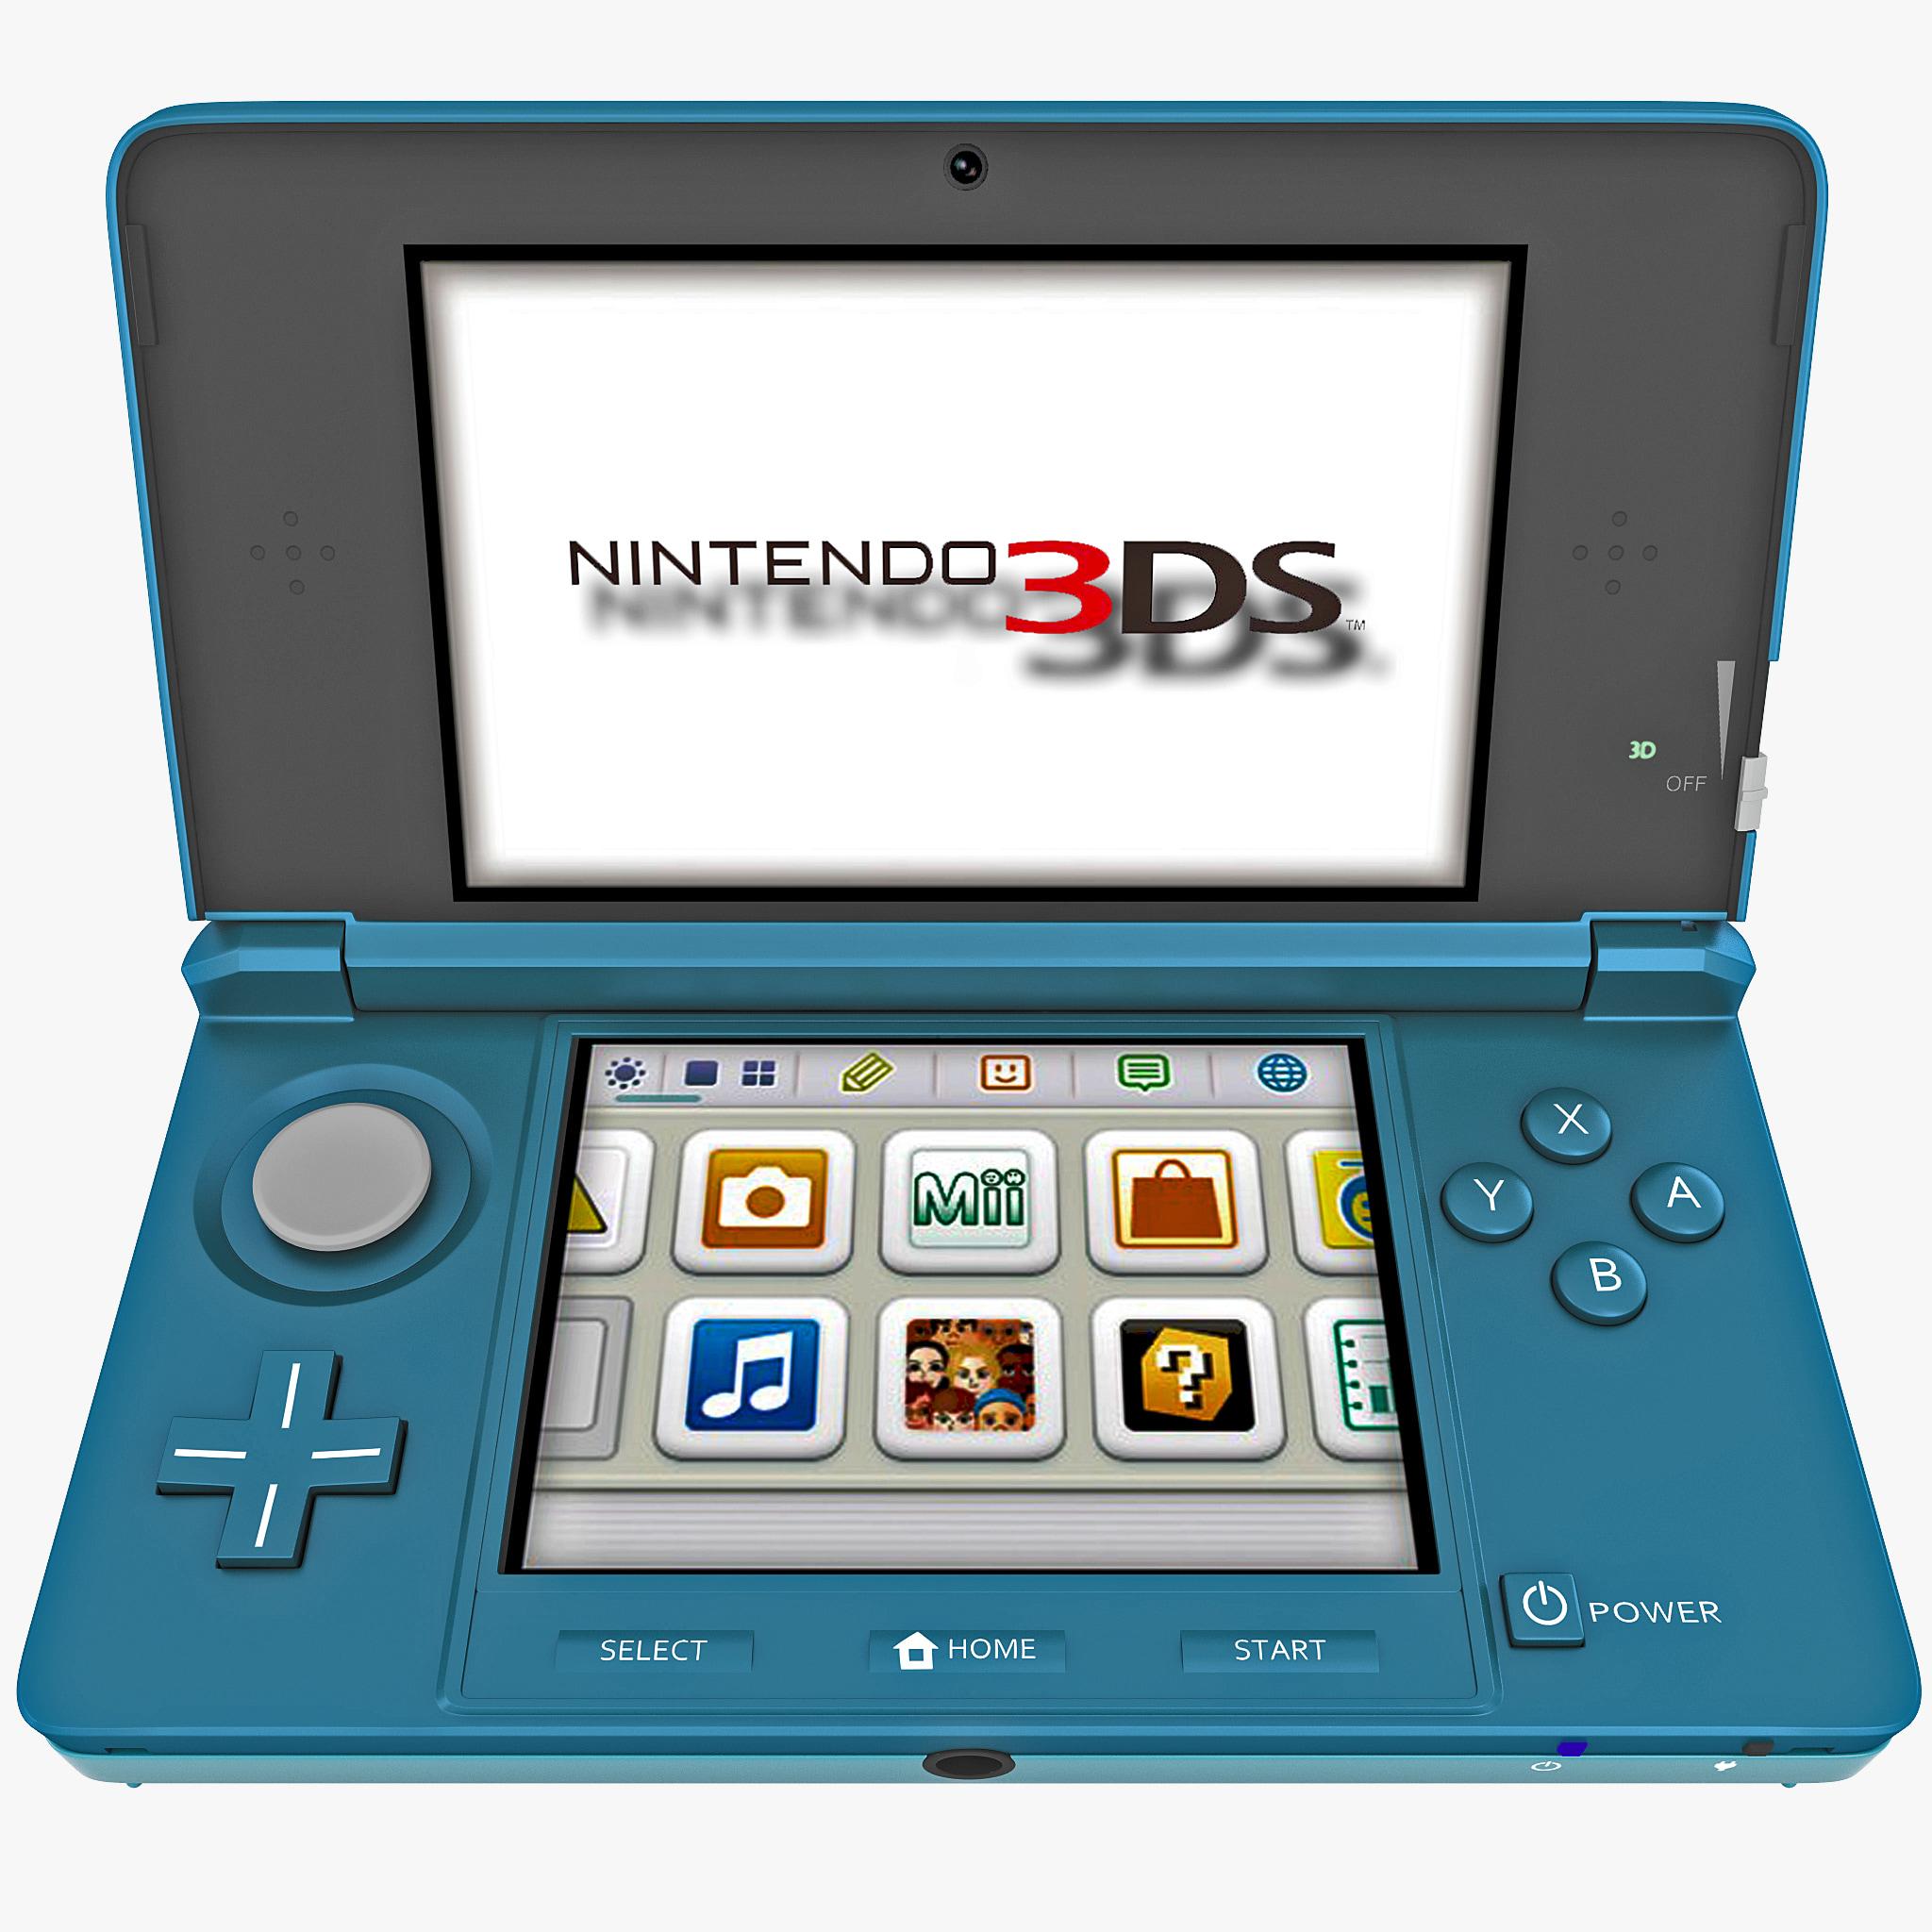 Nintendo 3DS_1.jpg